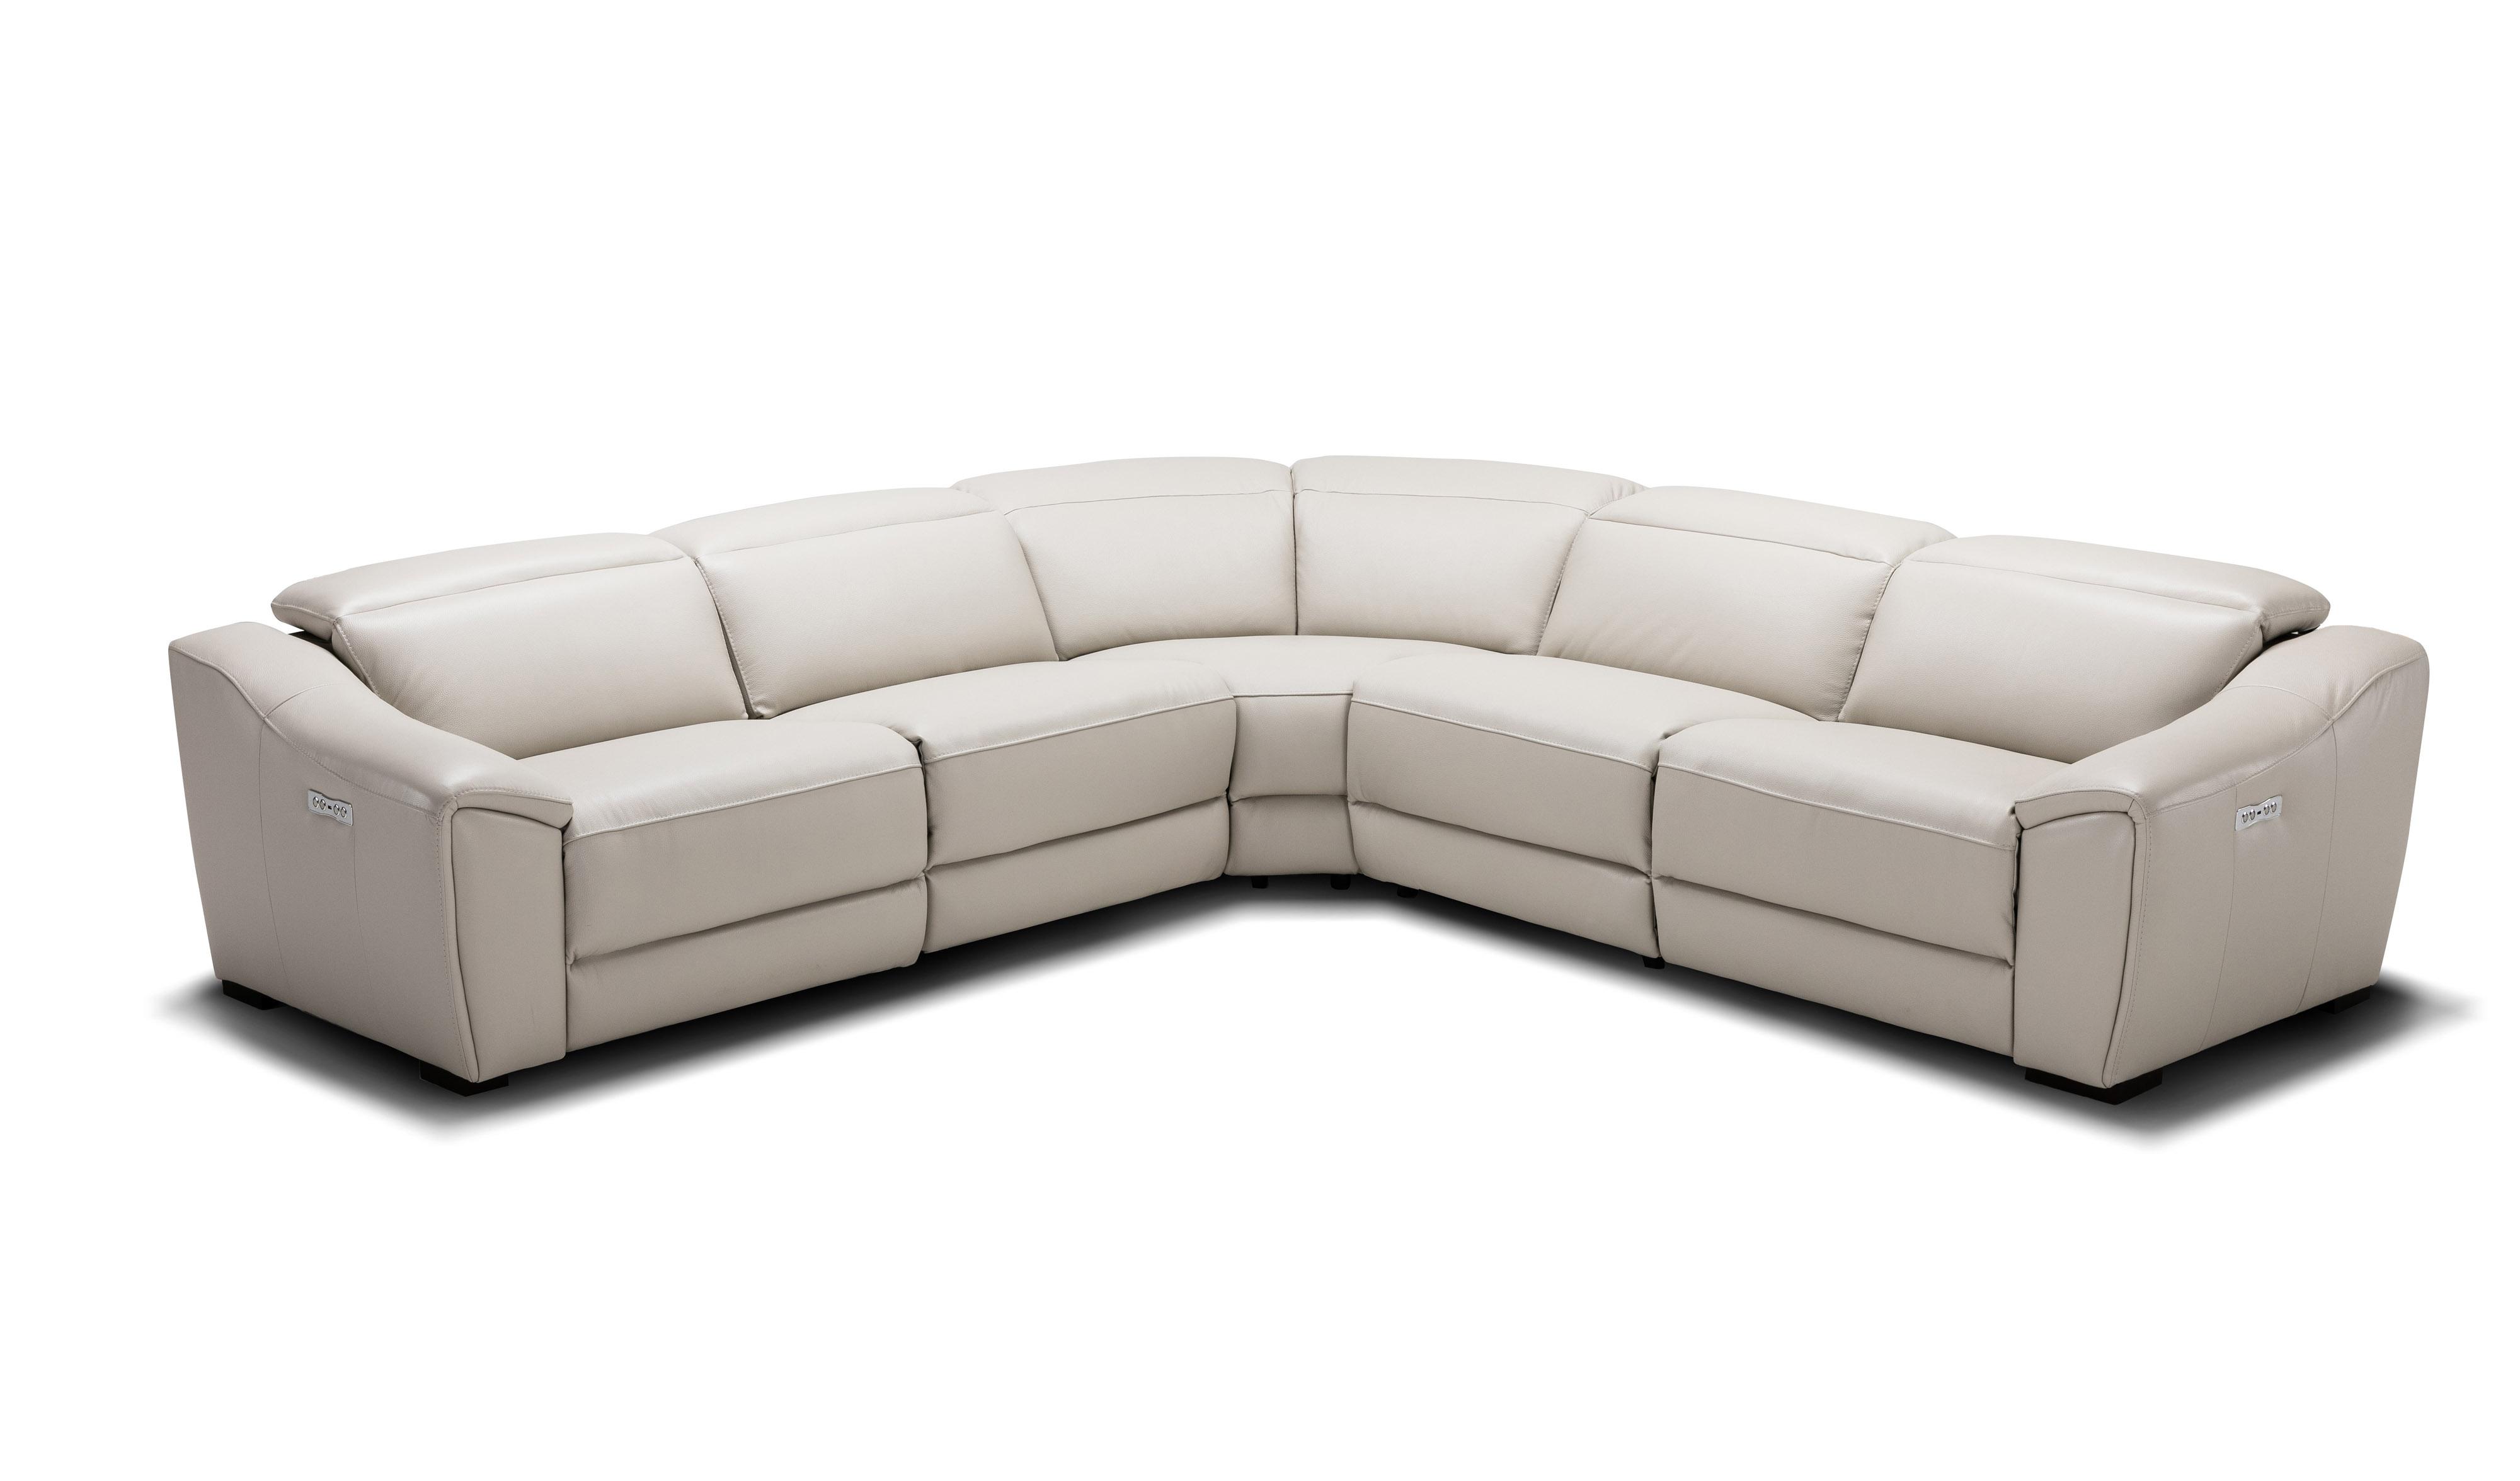 leather sectional sofa sacramento repair austin advanced adjustable full corner couch